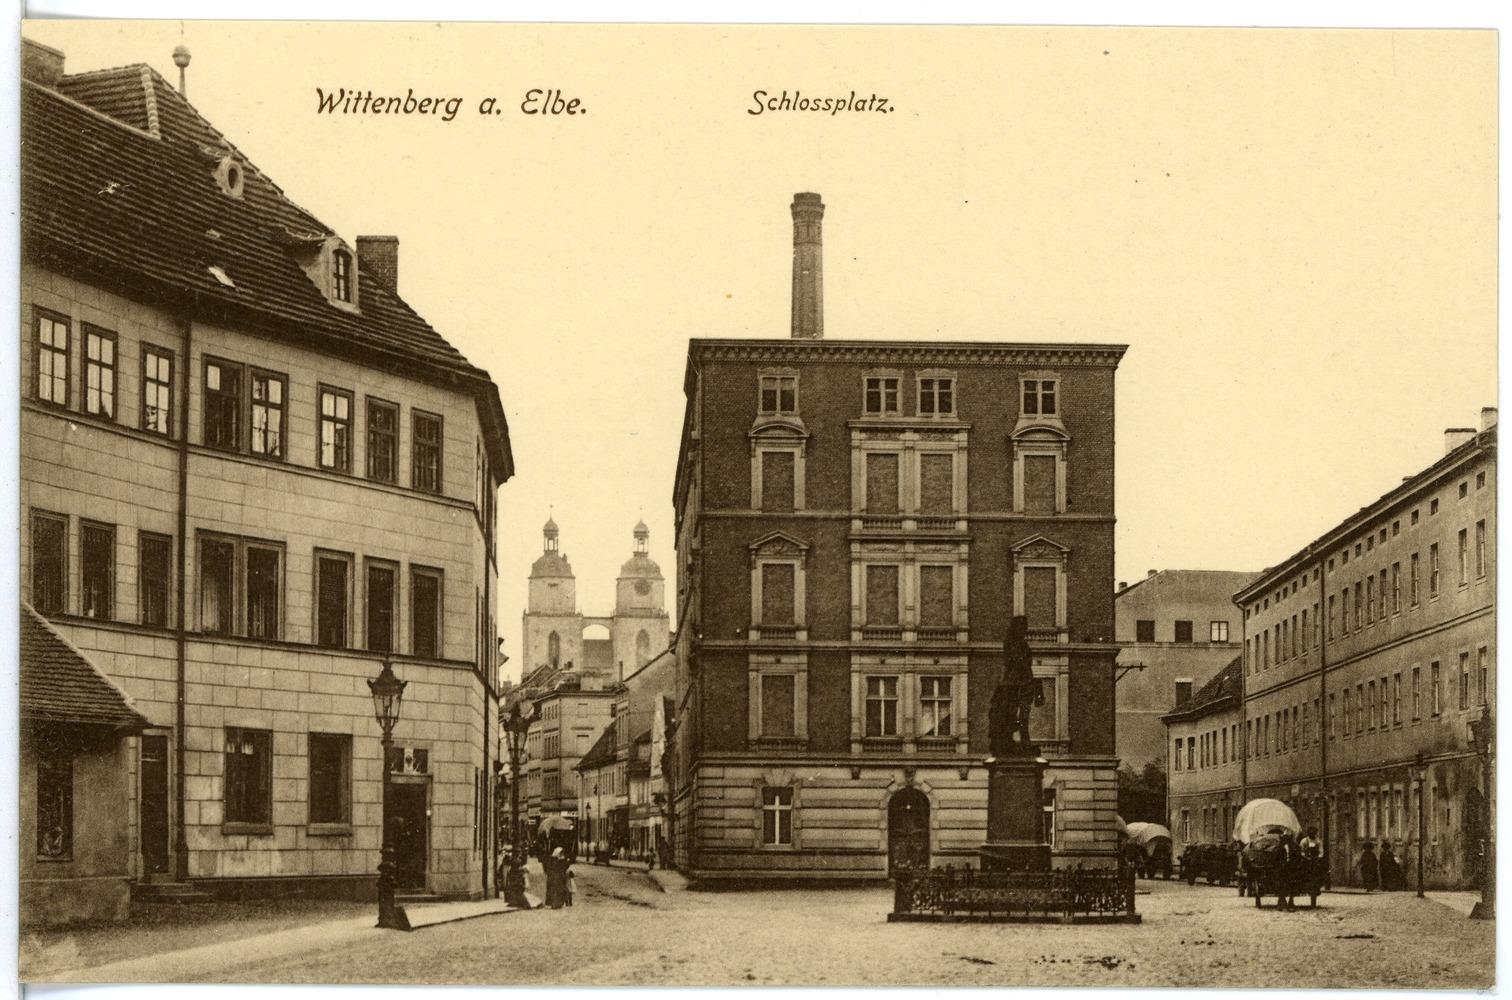 File:16783-Wittenberg-1913-Schloßplatz-Brück & Sohn Kunstverlag.jpg